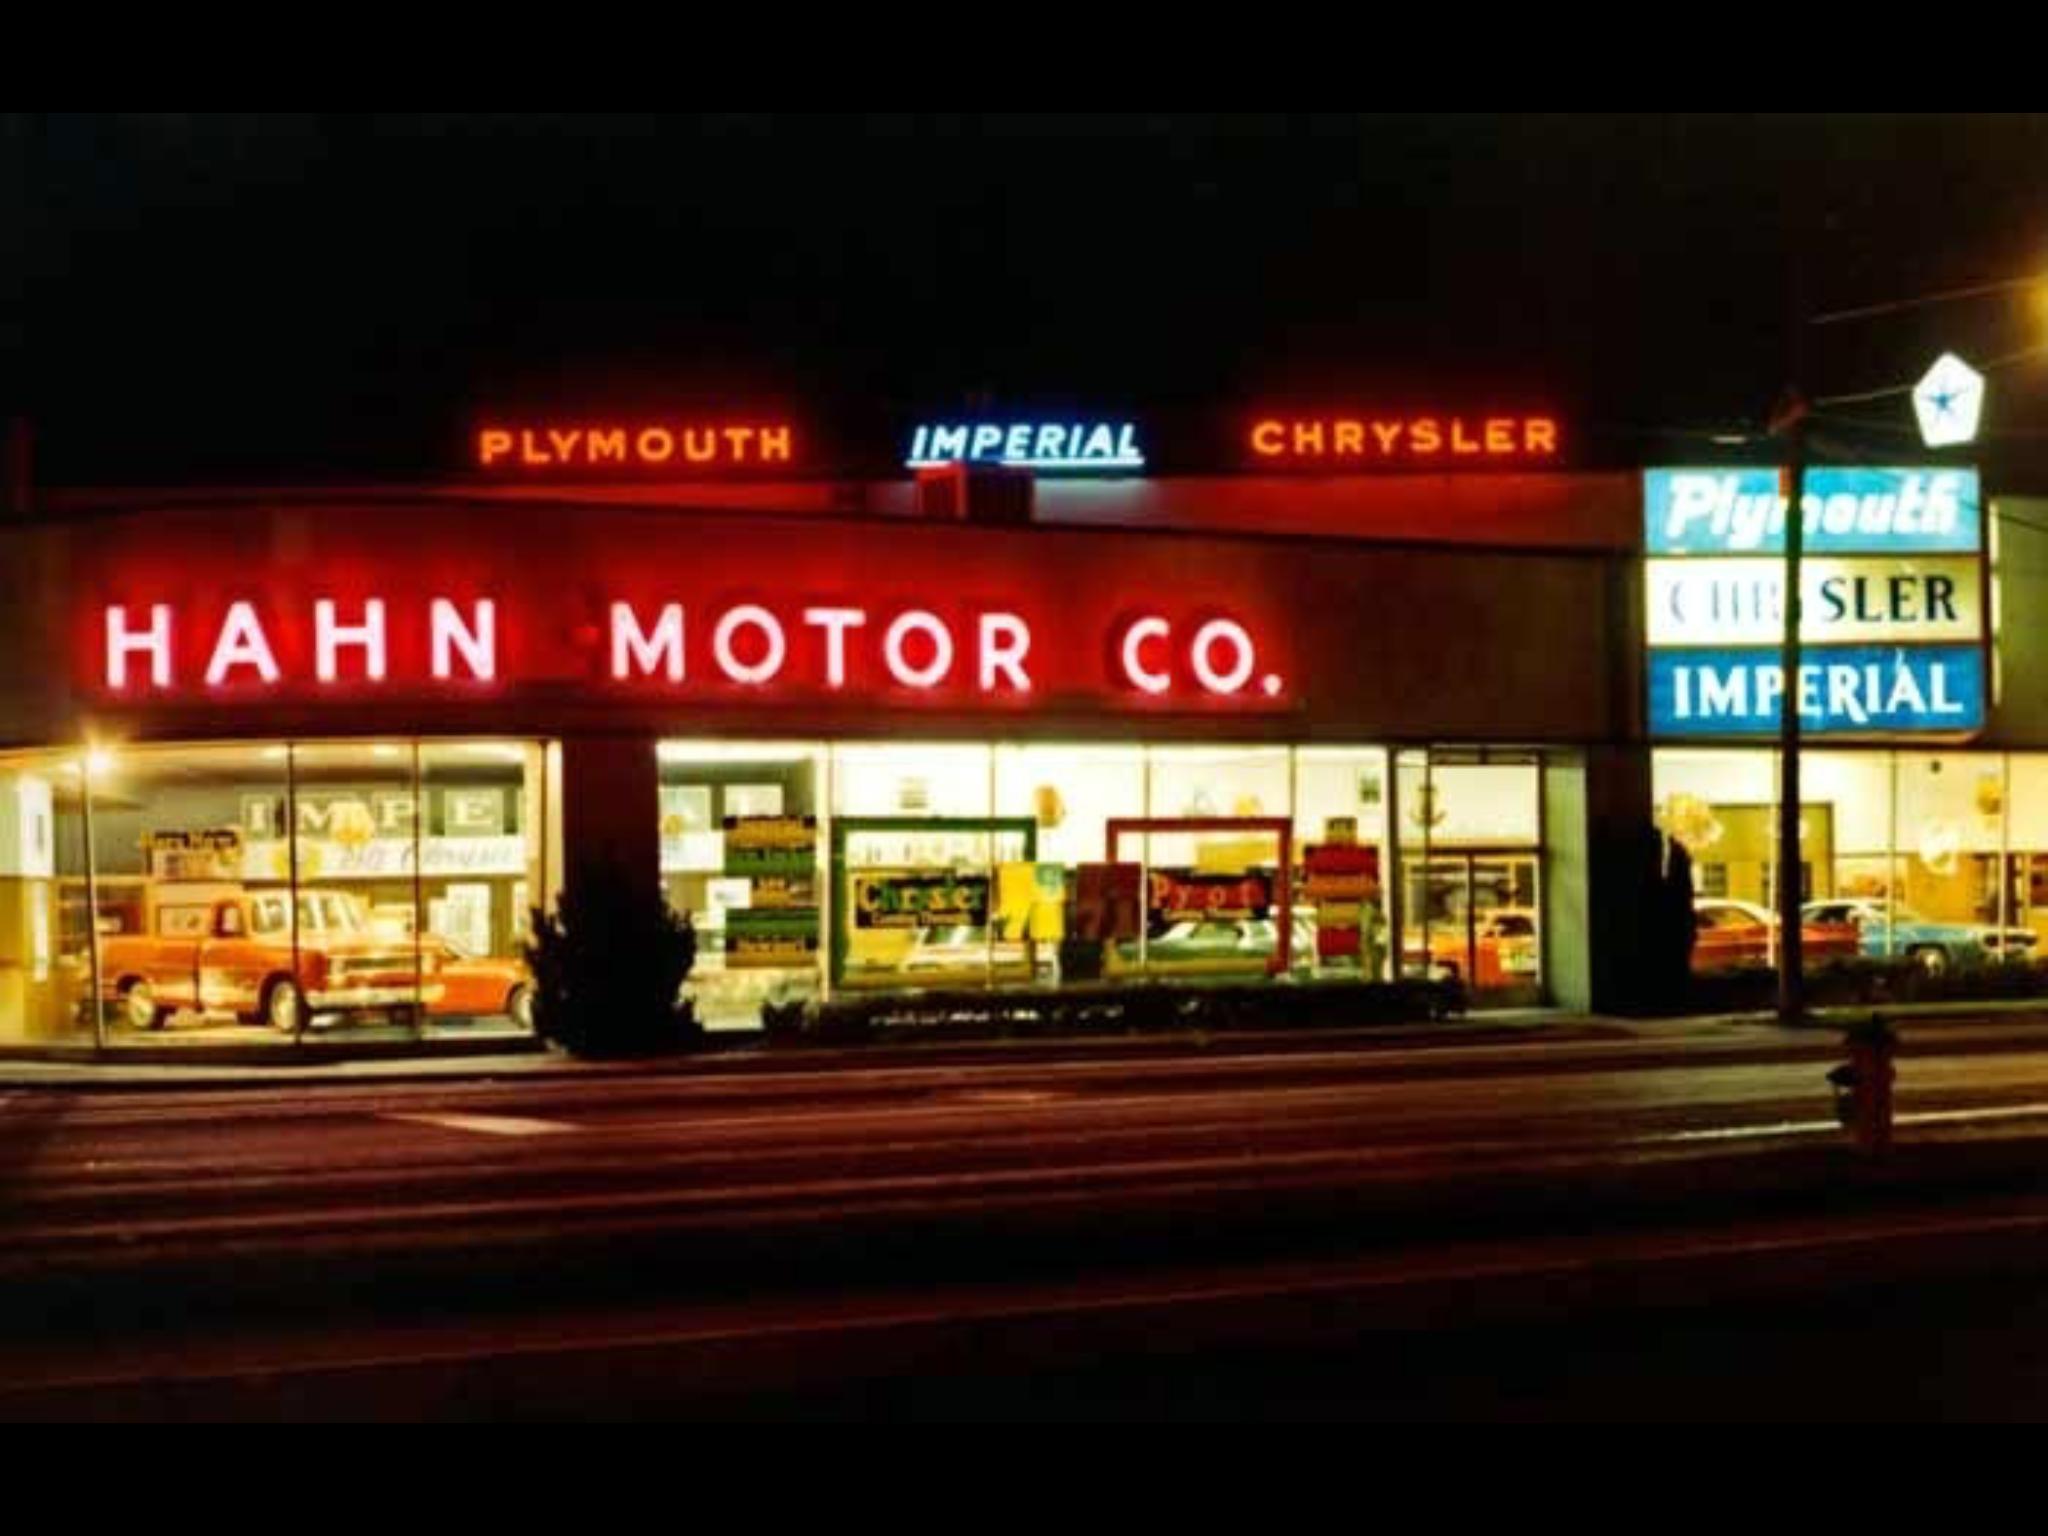 Hahn Motors Co., Chrysler Plymouth Imperial Dealership ...